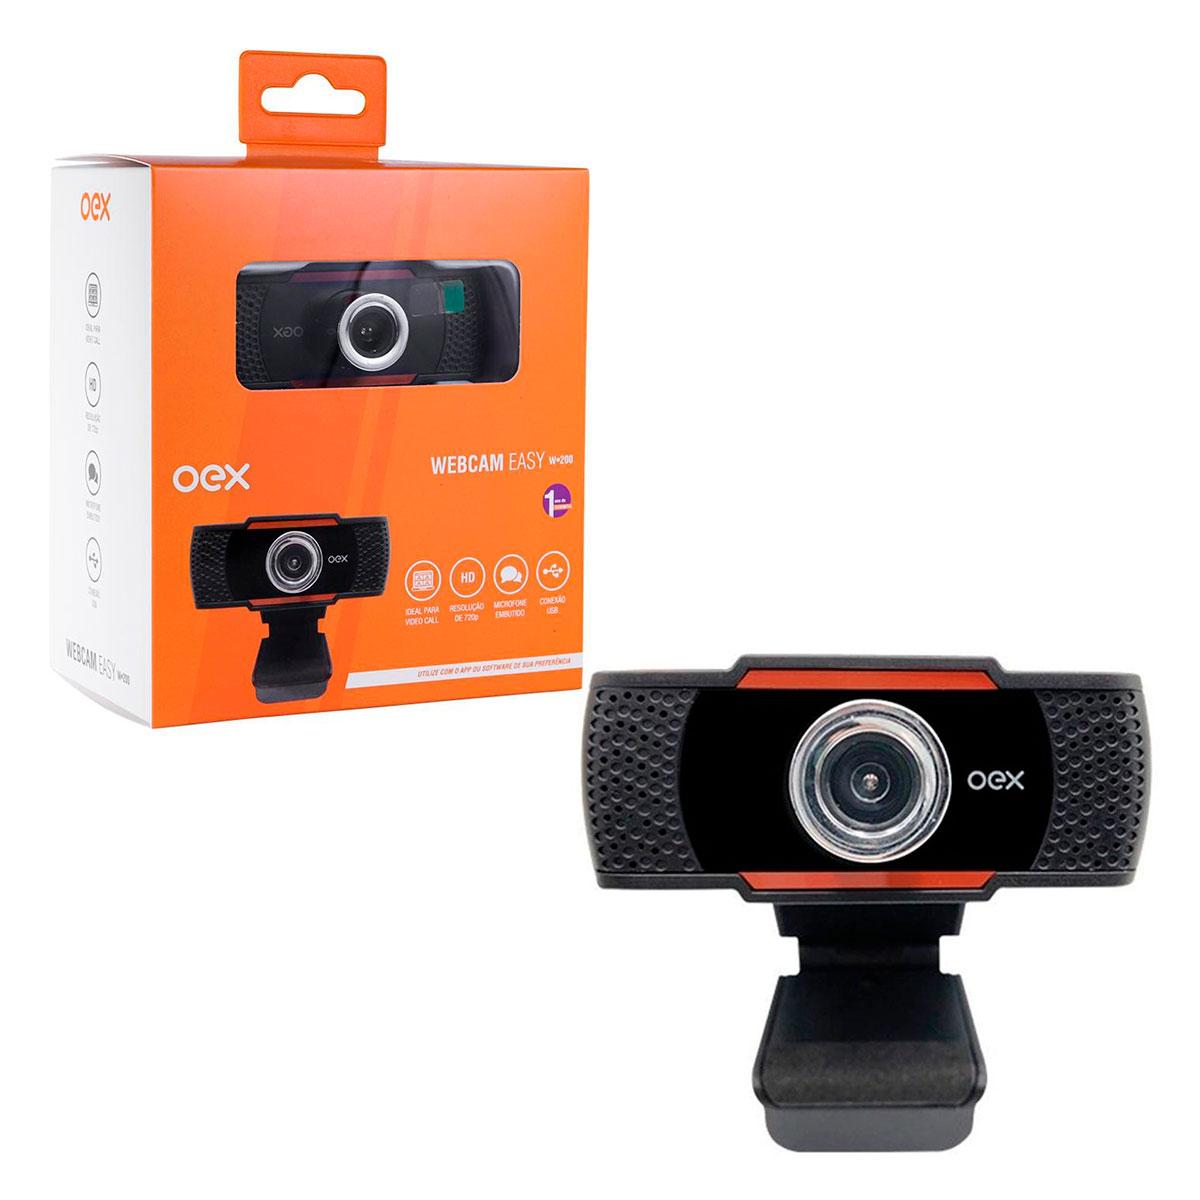 Webcam Oex Easy W200, USB 2.0/P2 (3.5mm), 720p(30FPS), Microfone Embutido, Preto